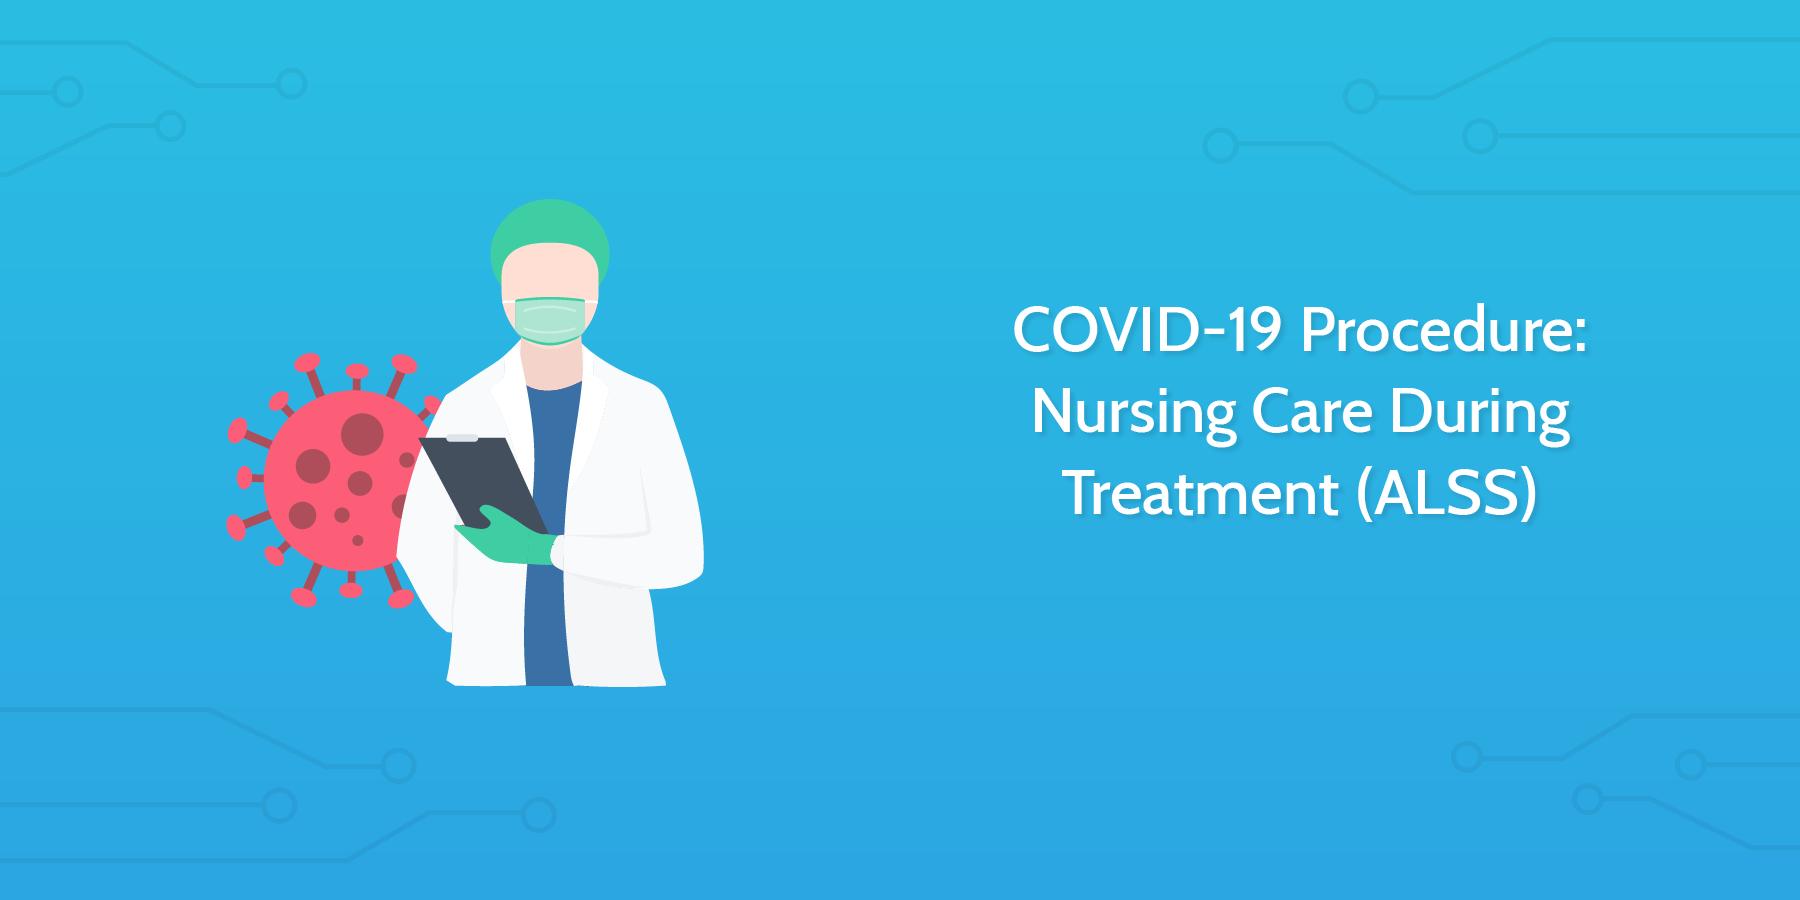 COVID-19 Procedure: Nursing Care During Treatment (ALSS)